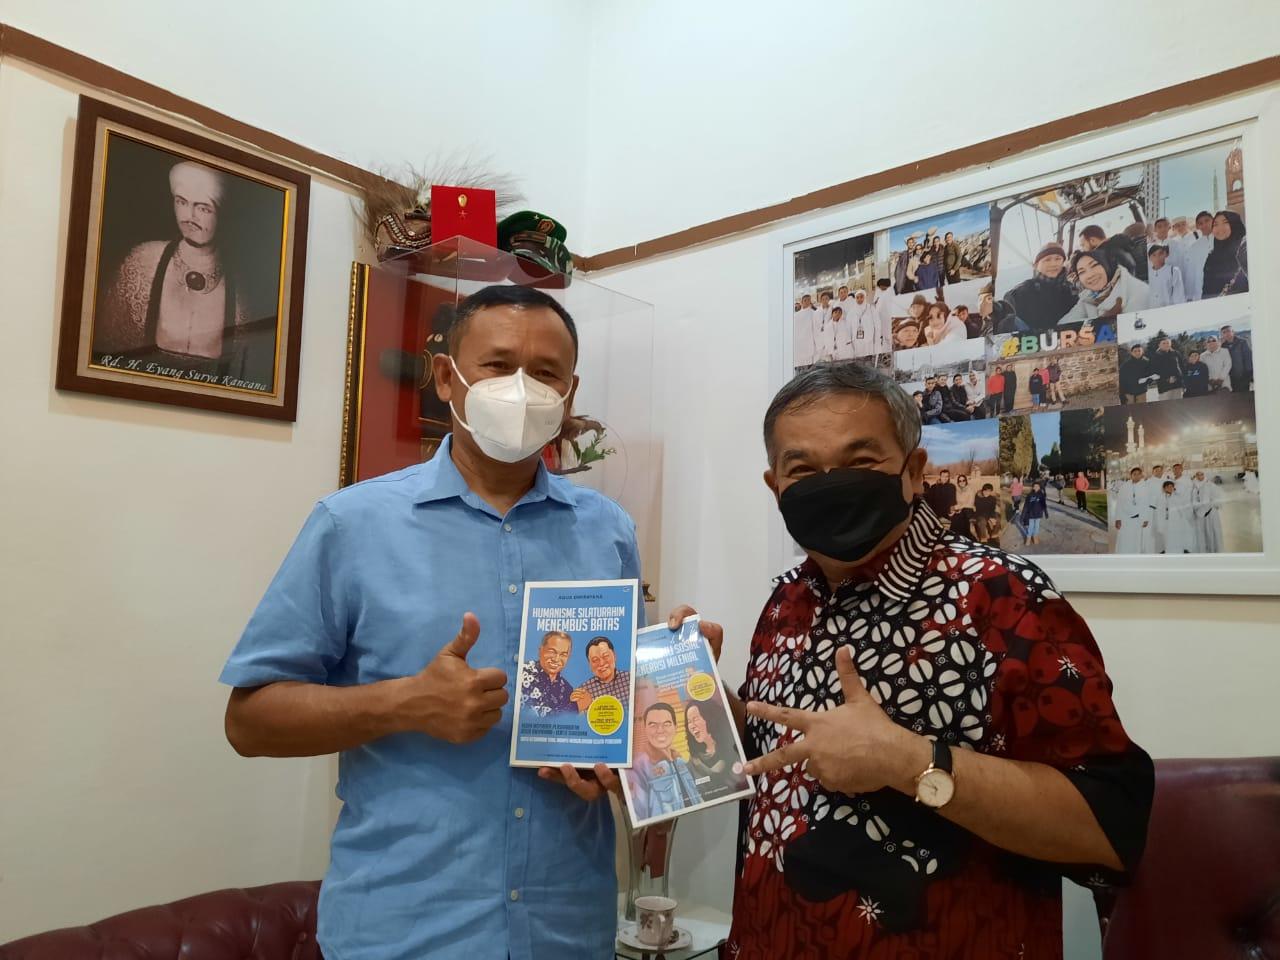 Pakar Komunikasi dan Motivator Nasional Dr Aqua Dwipayana memberikan buku karyanya kepada Danrem 061/Surya Kancana Bogor, Jawa Barat, Brigjen TNI Achmad Fauzi. (Foto: Dok/Tugu Jatim)